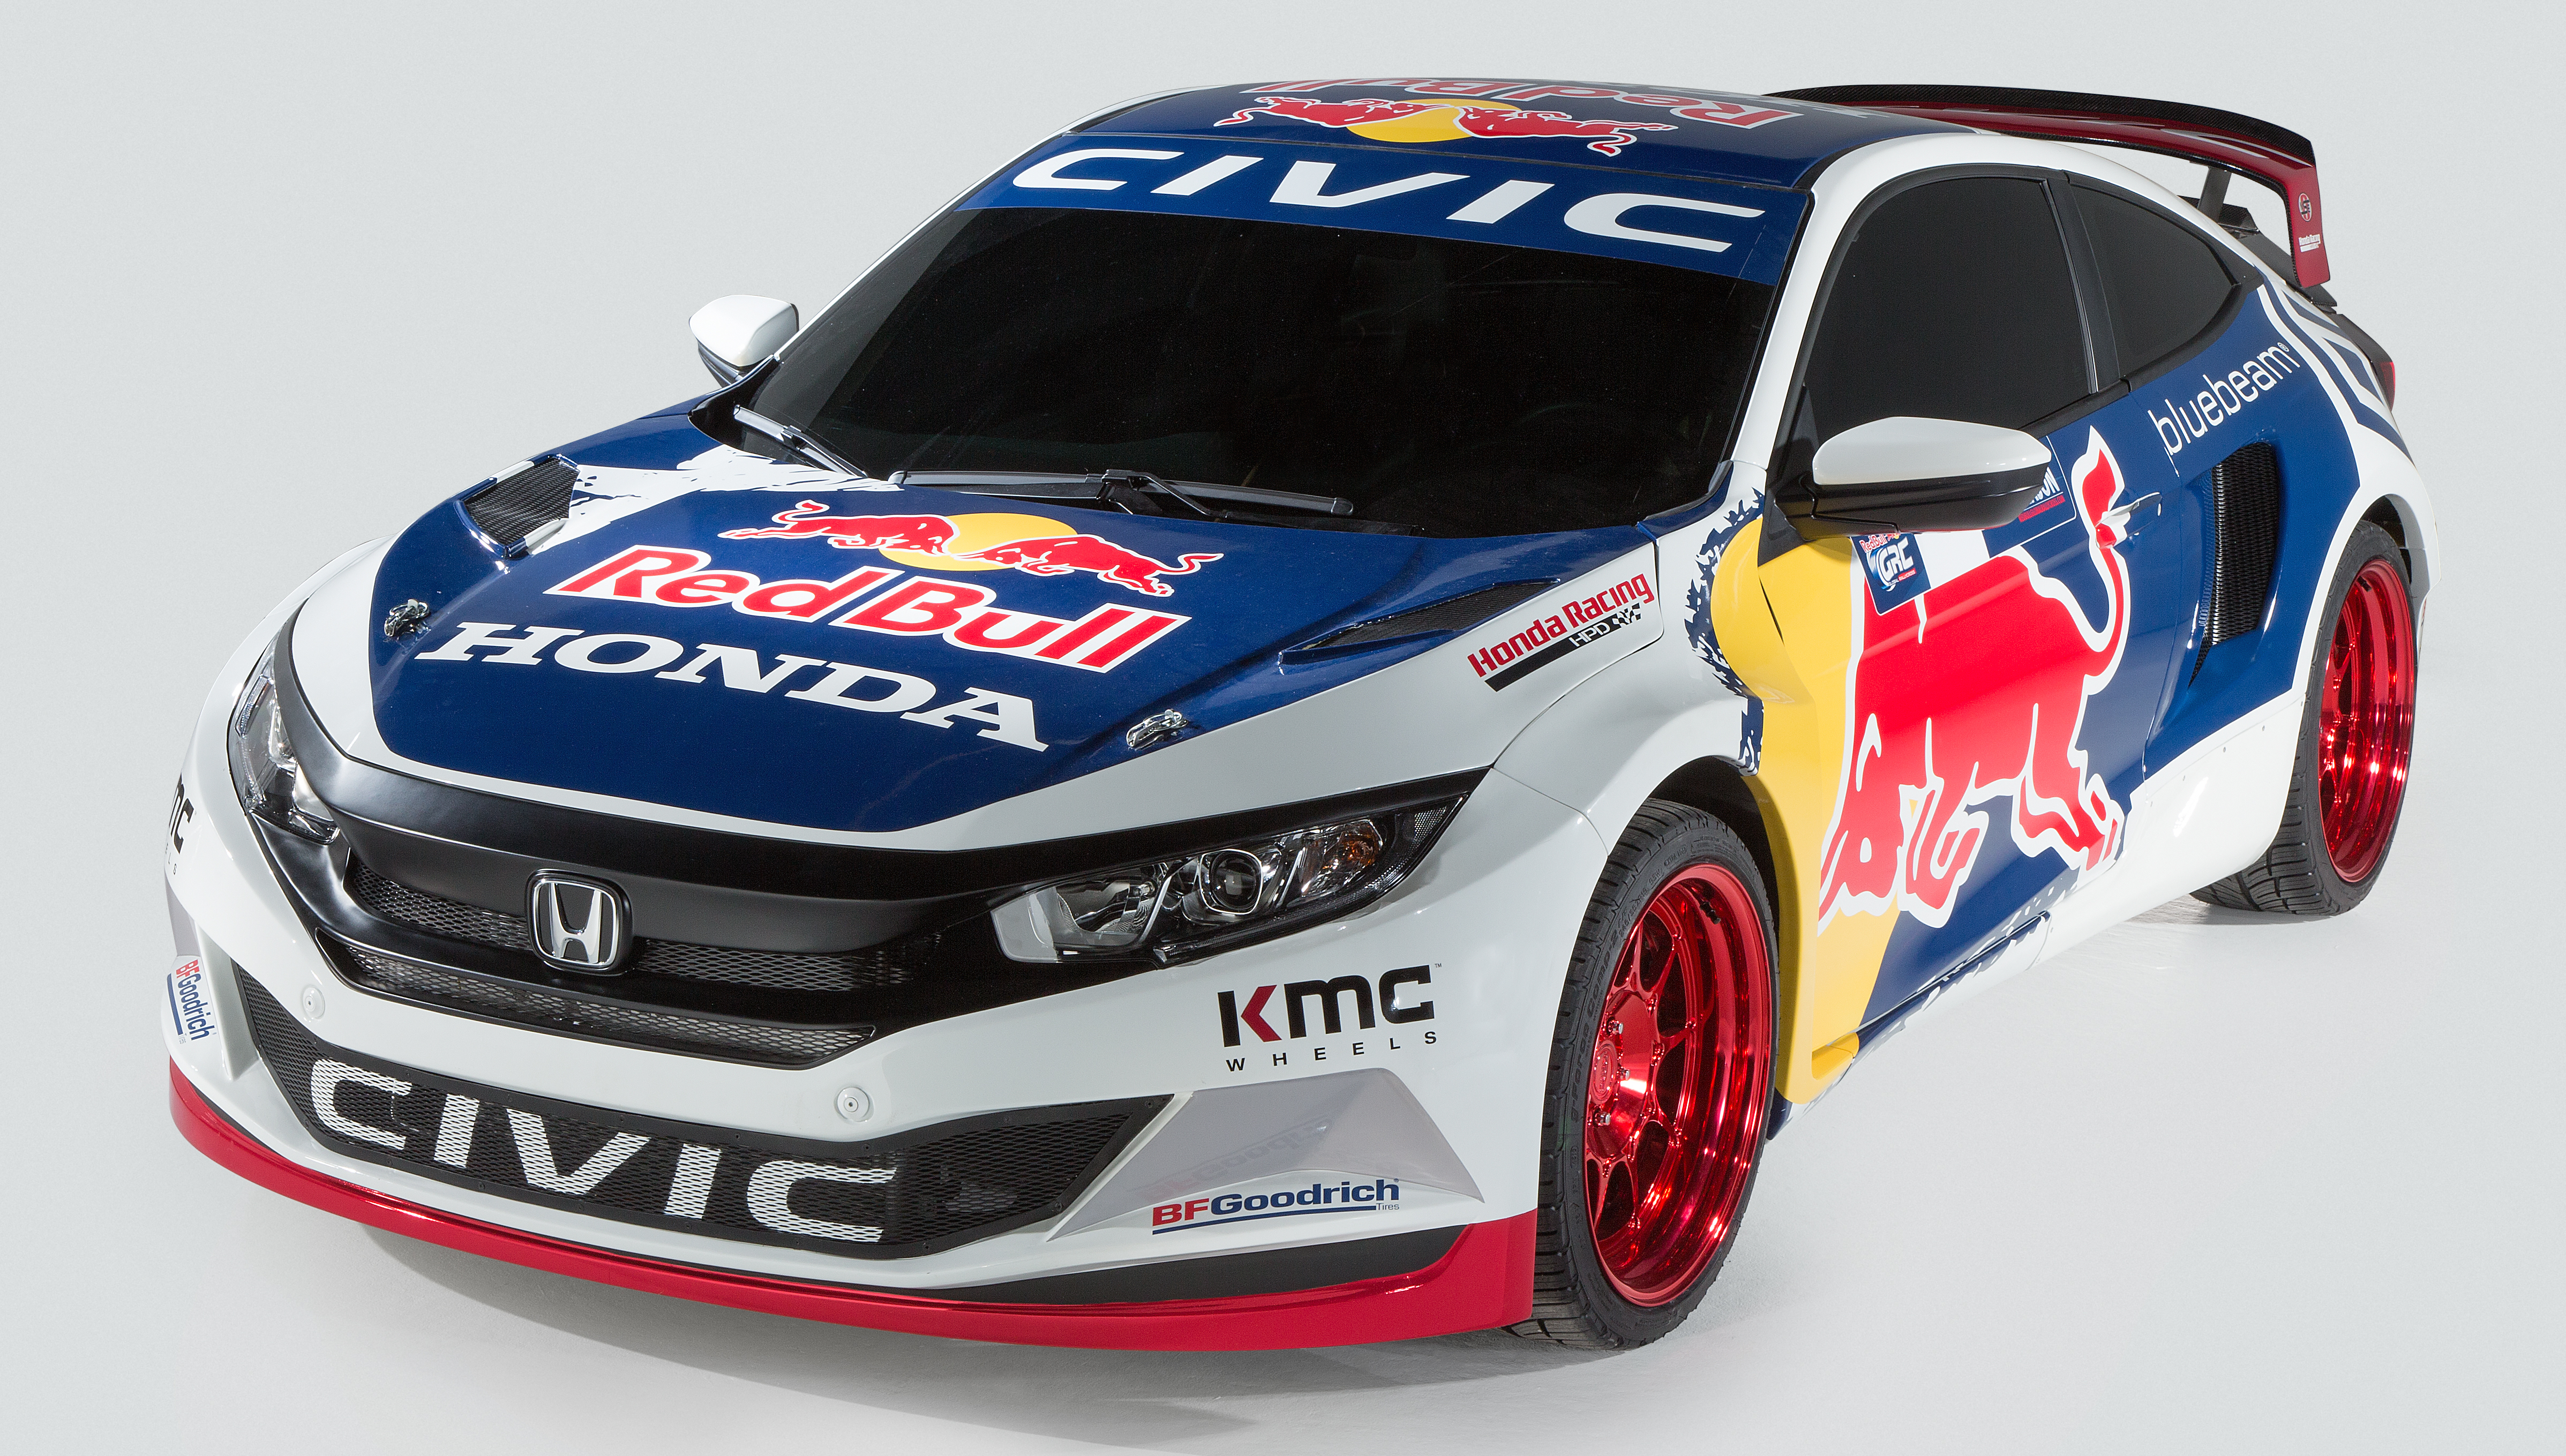 Grc Civic >> 2016 Honda Civic Red Bull Global Rallycross unveiled Image 464853